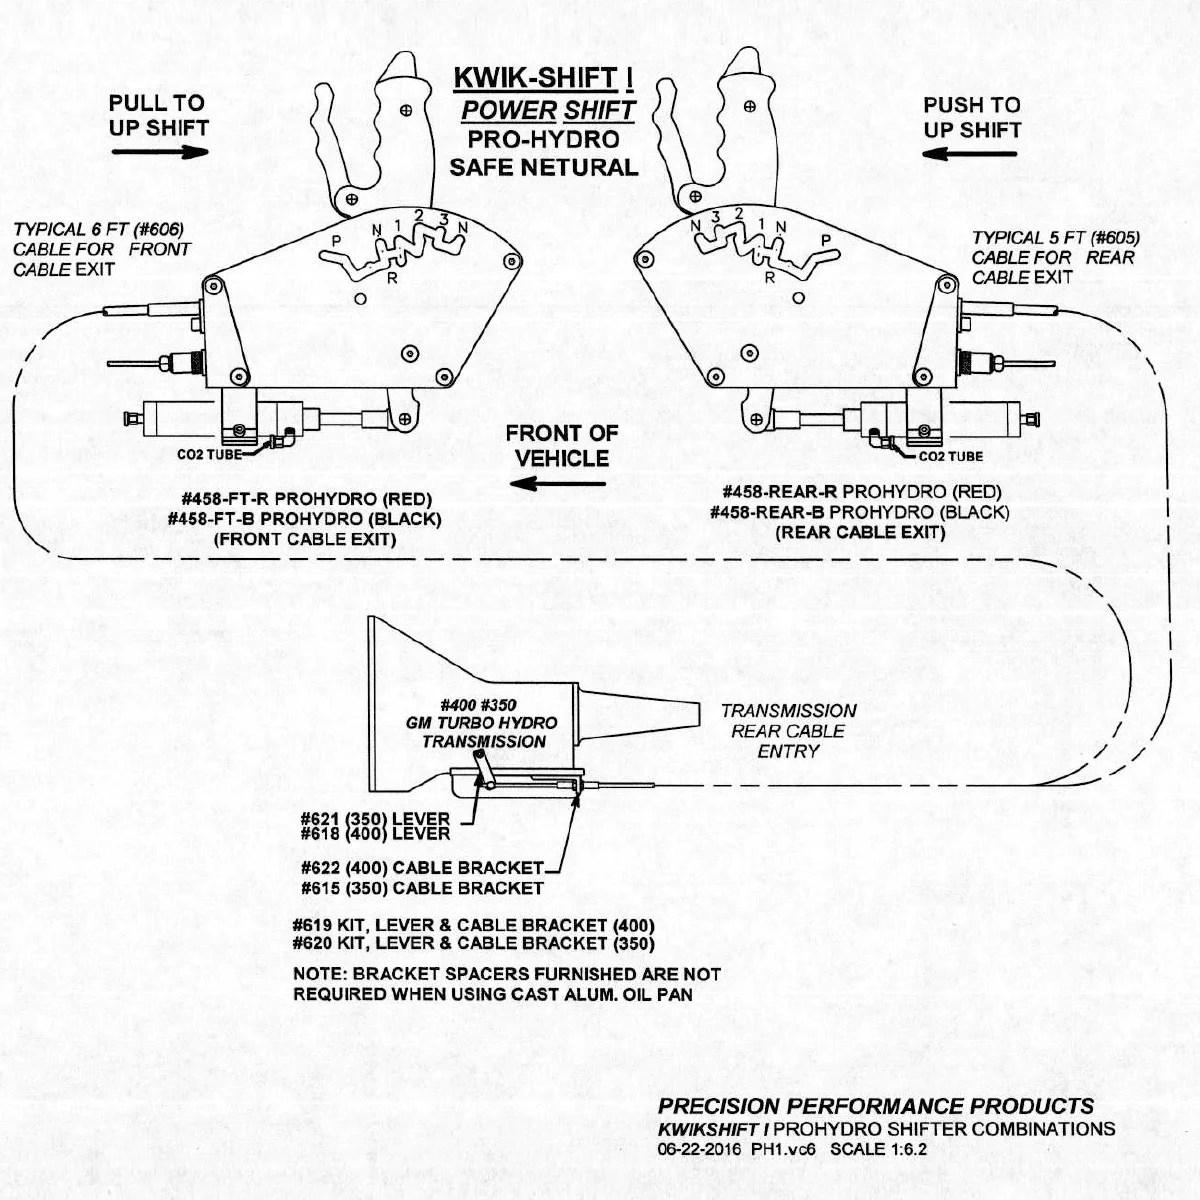 hight resolution of th400 sensor diagram wiring diagrams scematic th400 no reverse th400 sensor diagram